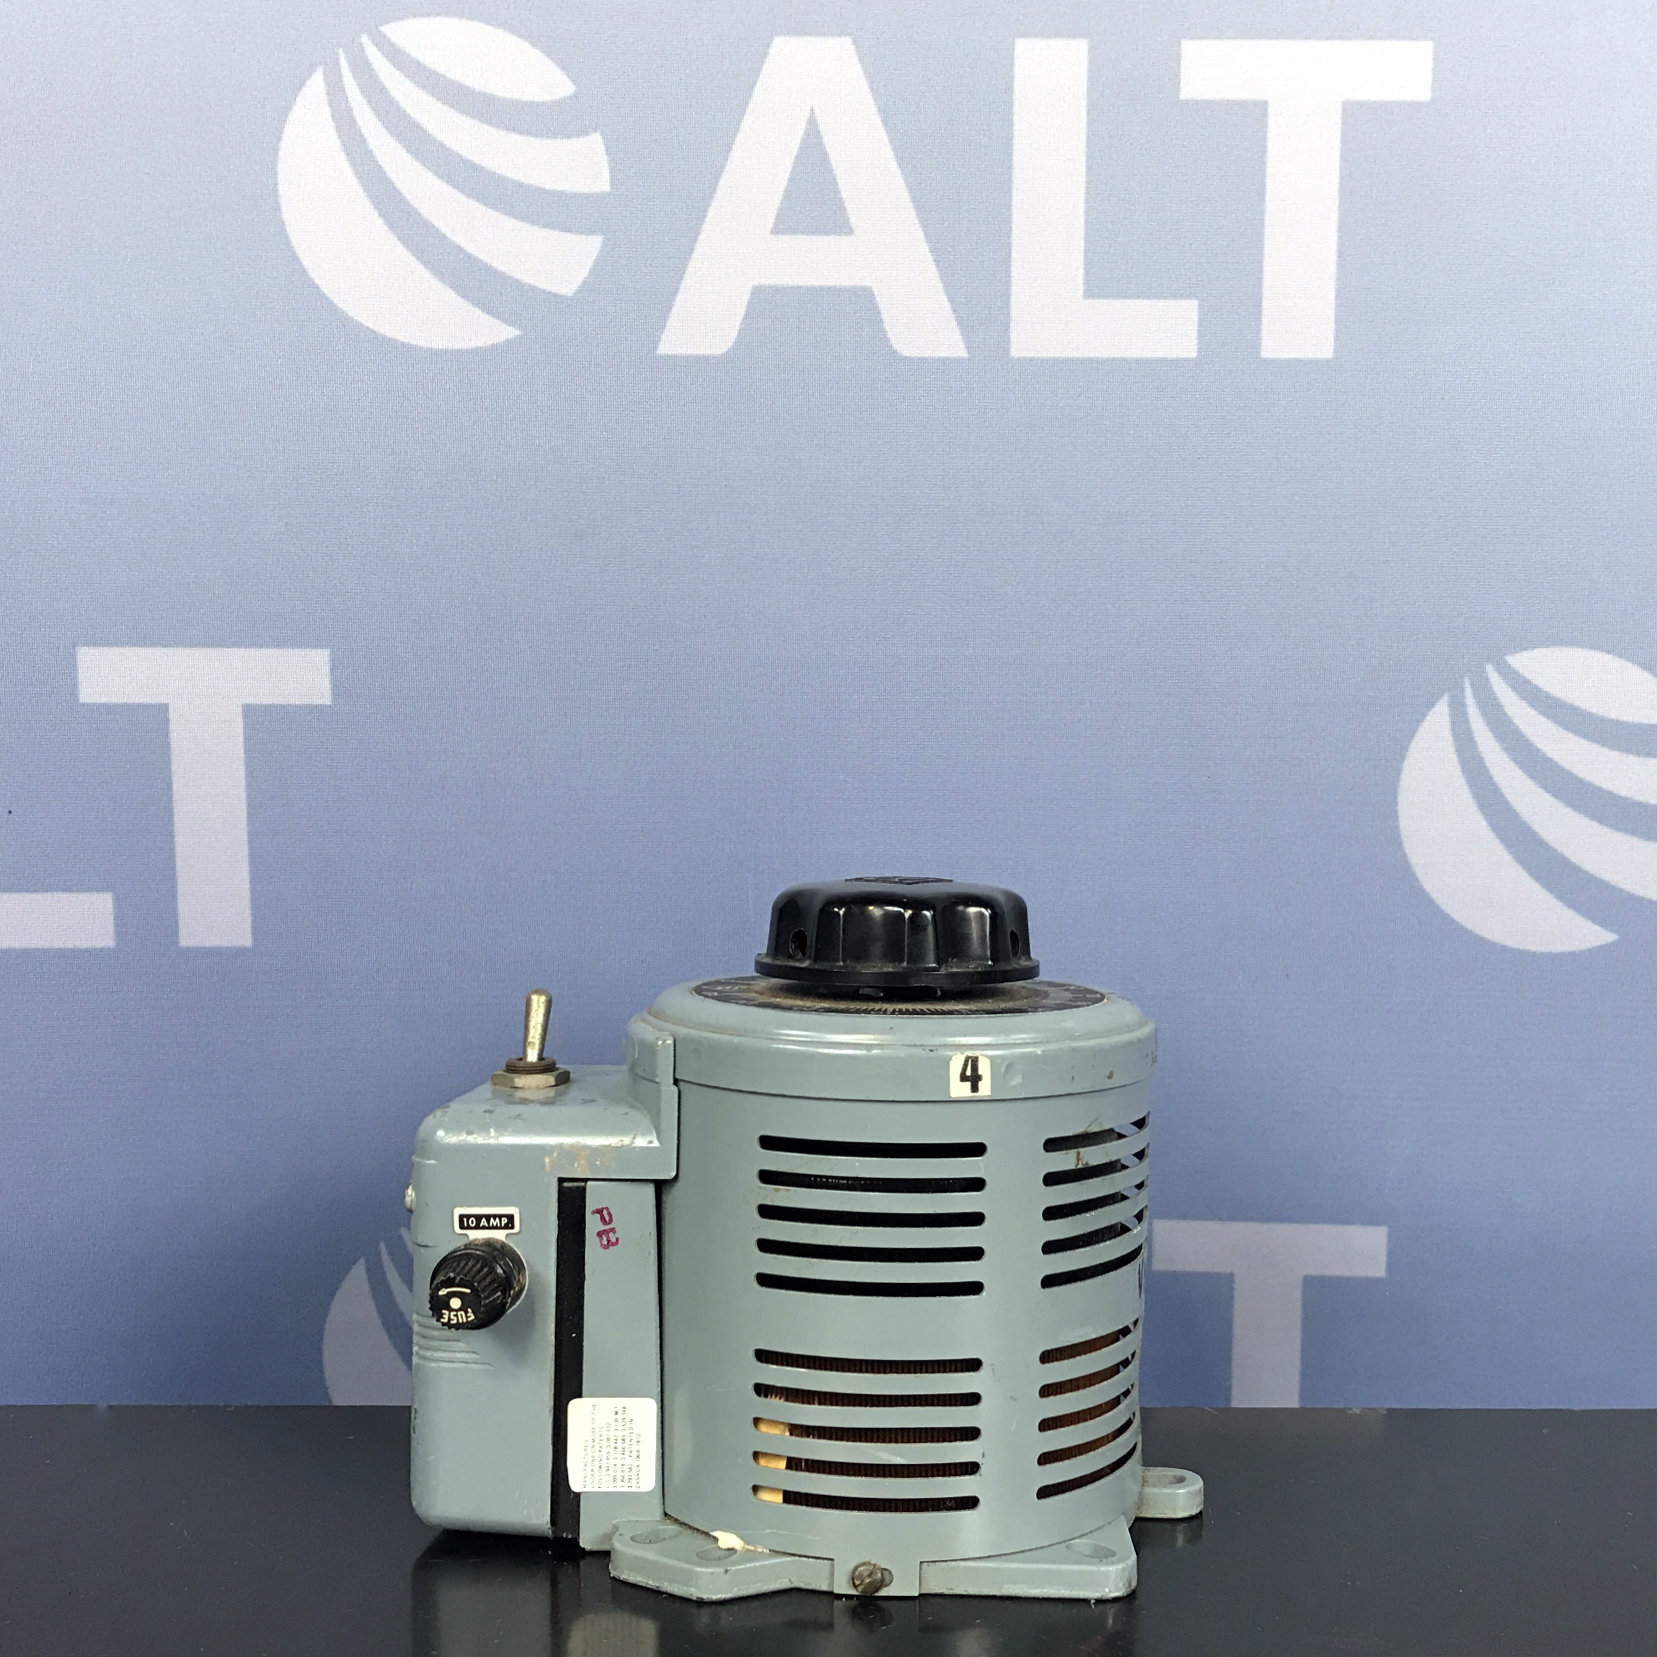 Superior Electric Type 3PN116B Powerstat Variable Transformer Image